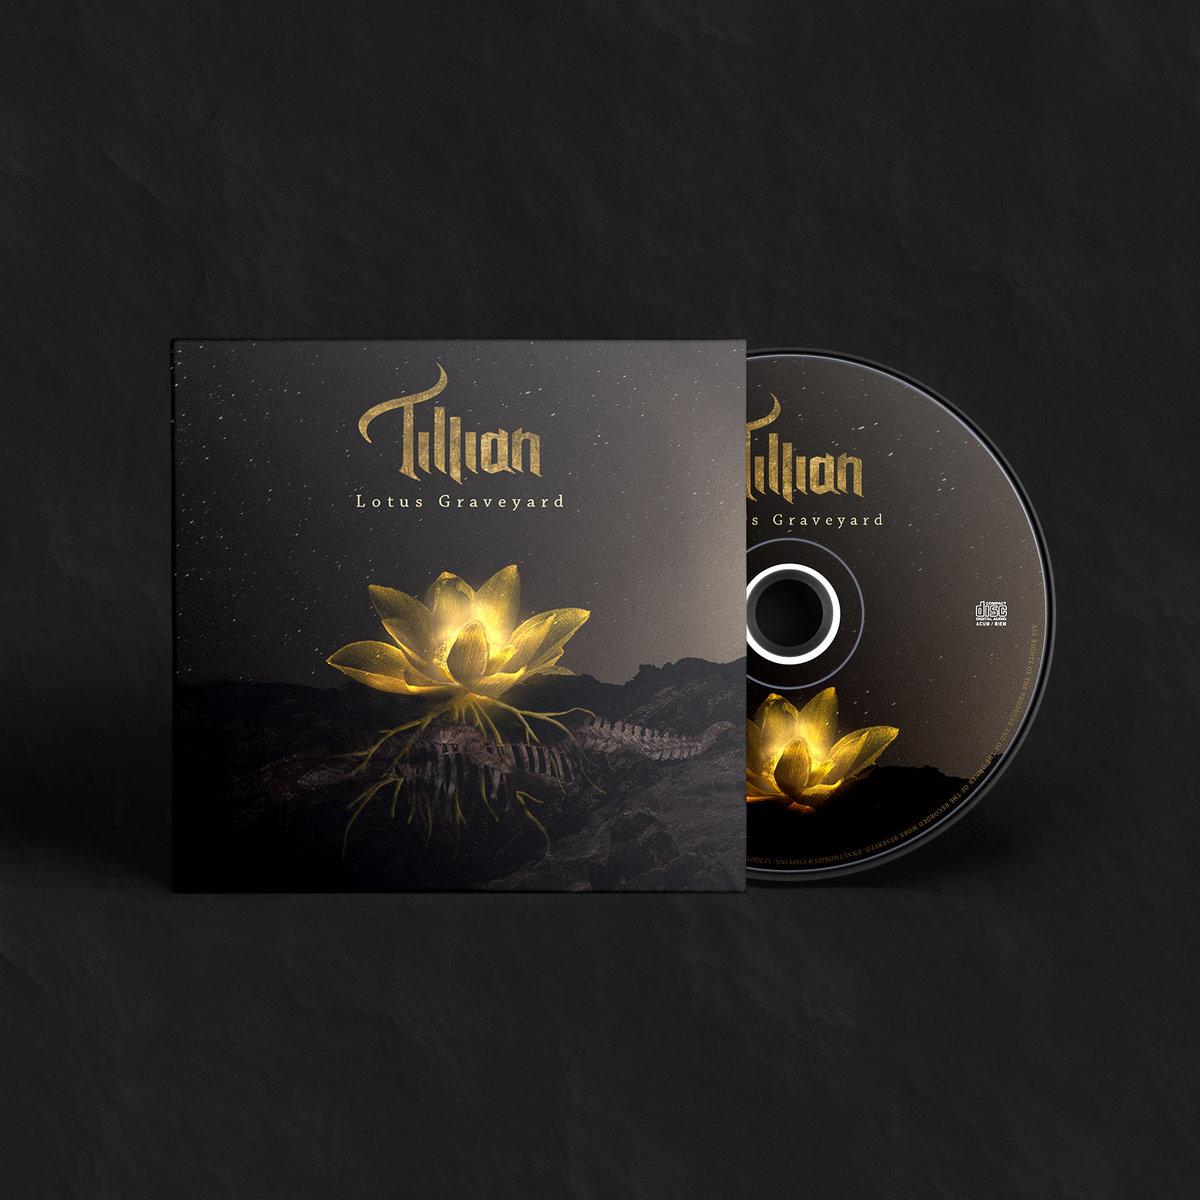 Lotus Graveyard | Tillian